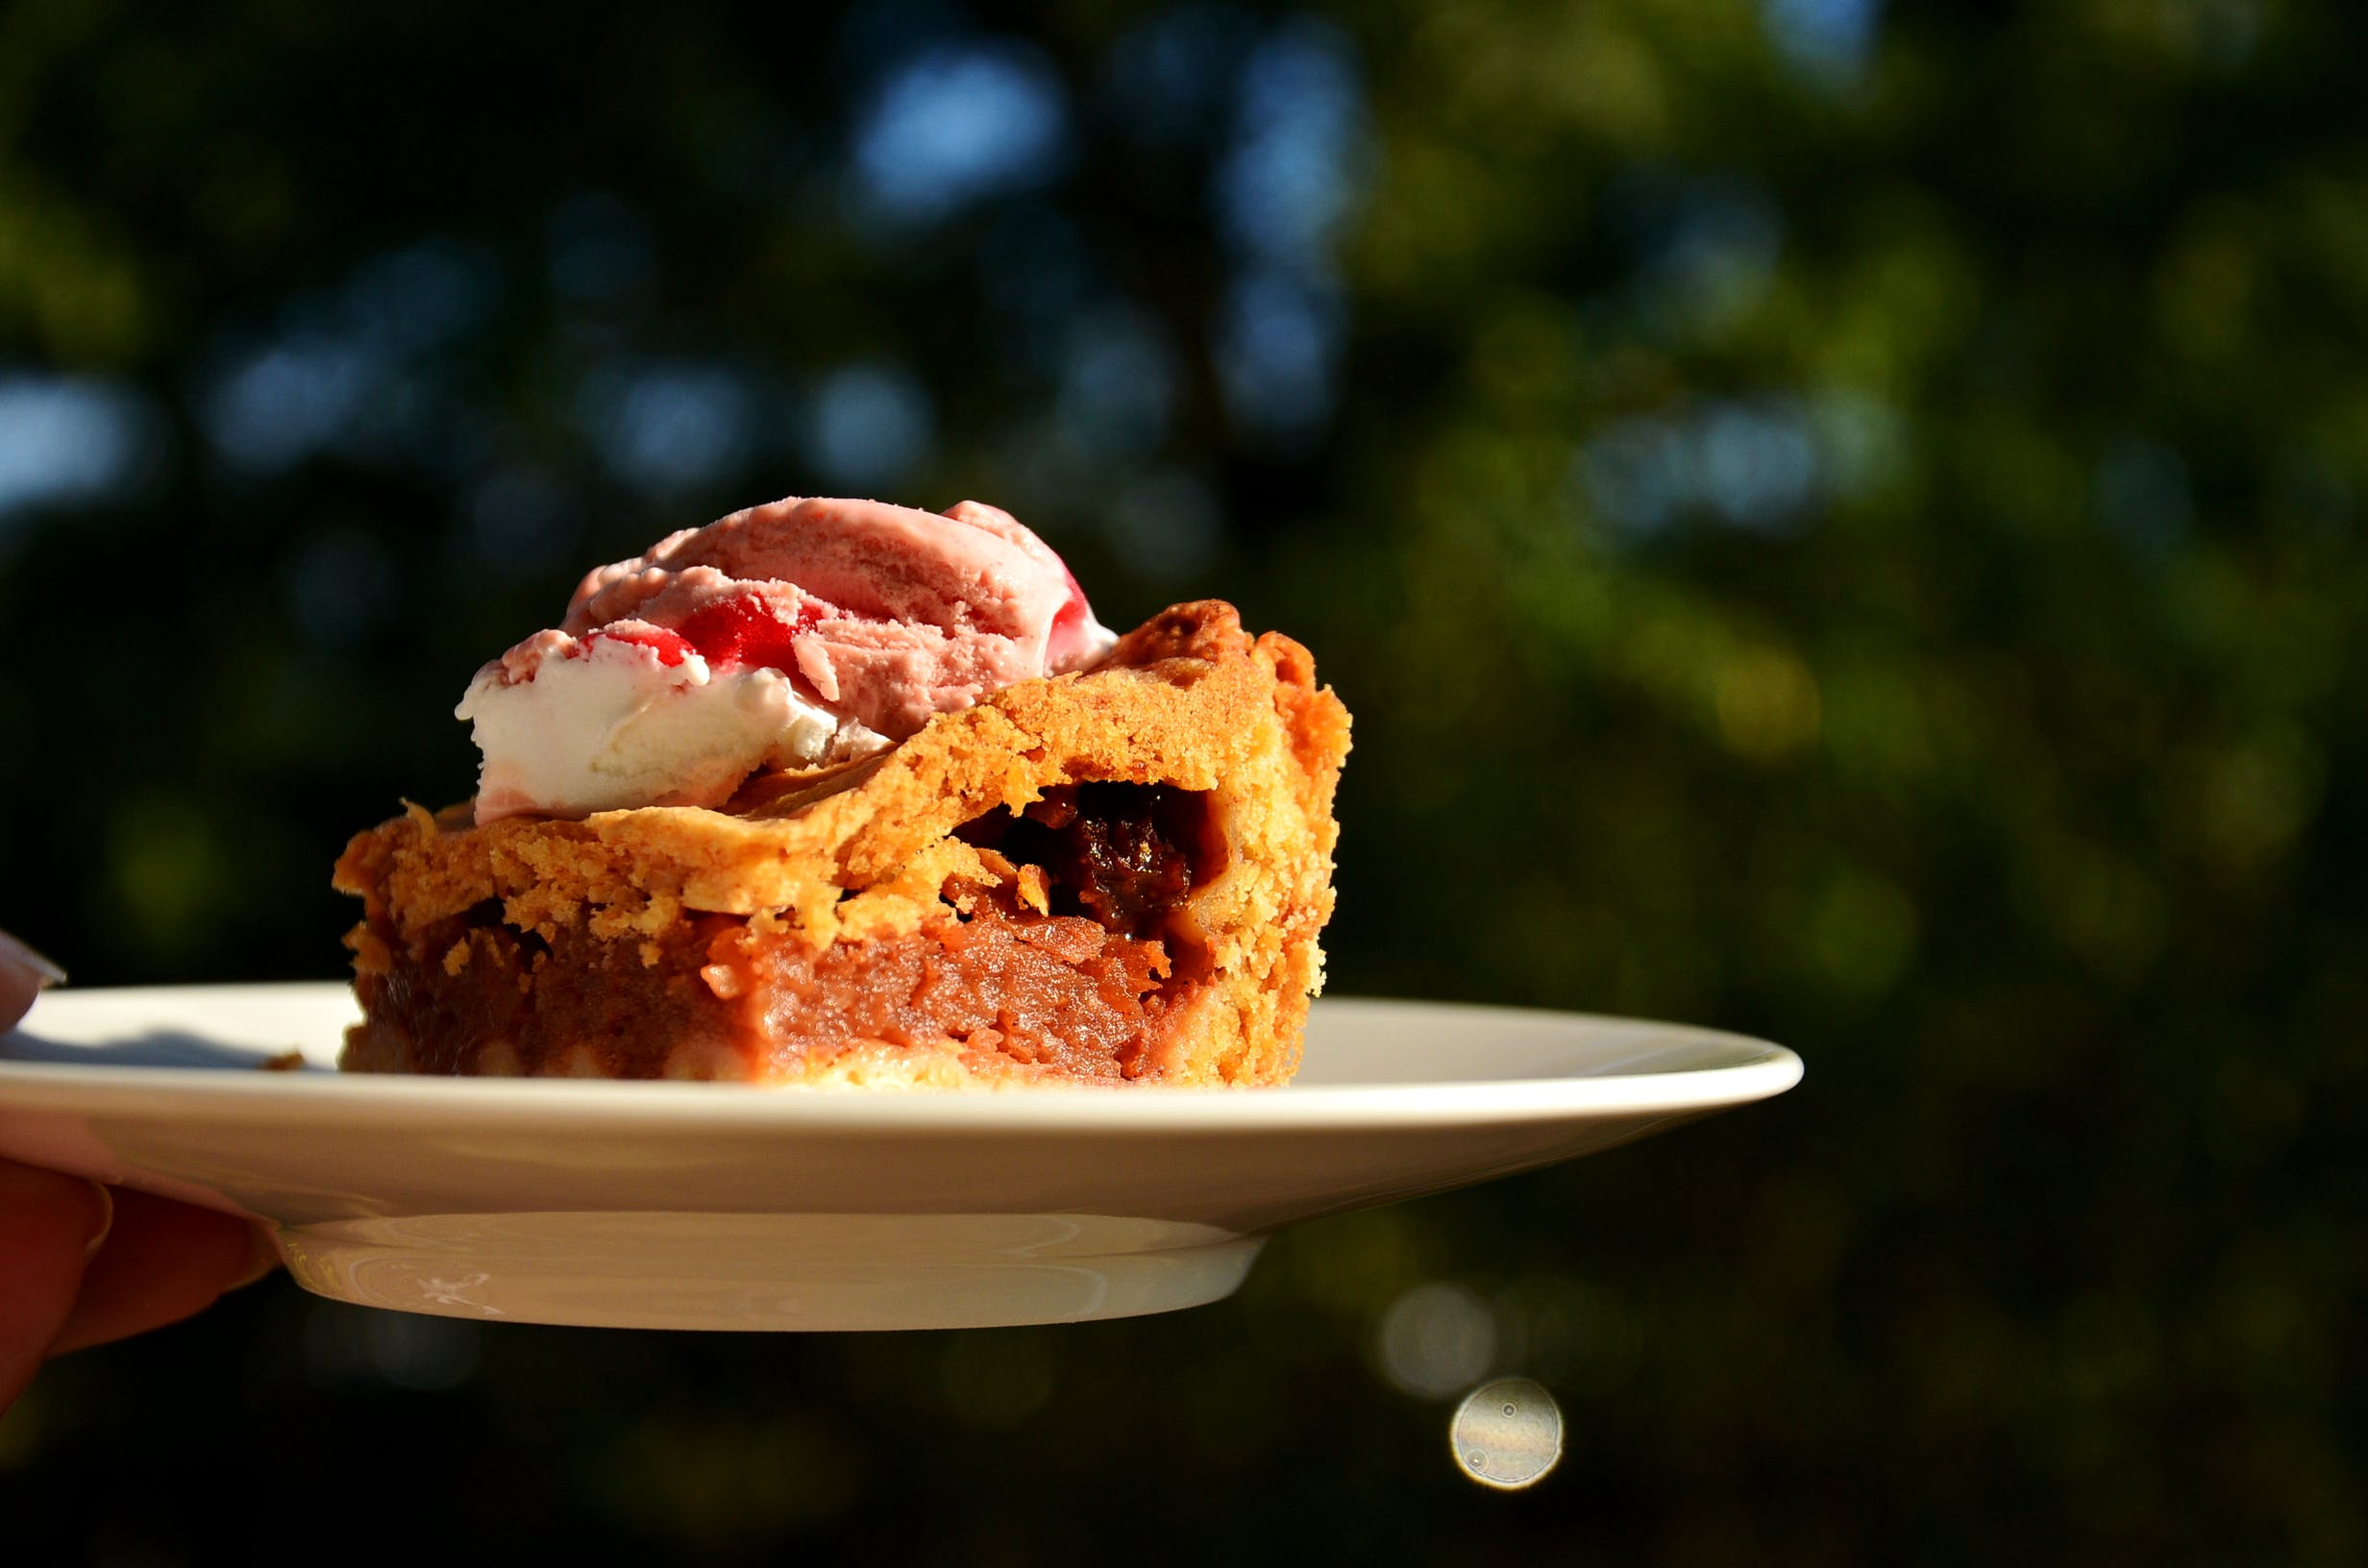 Free stock photo of food, cake, applepie